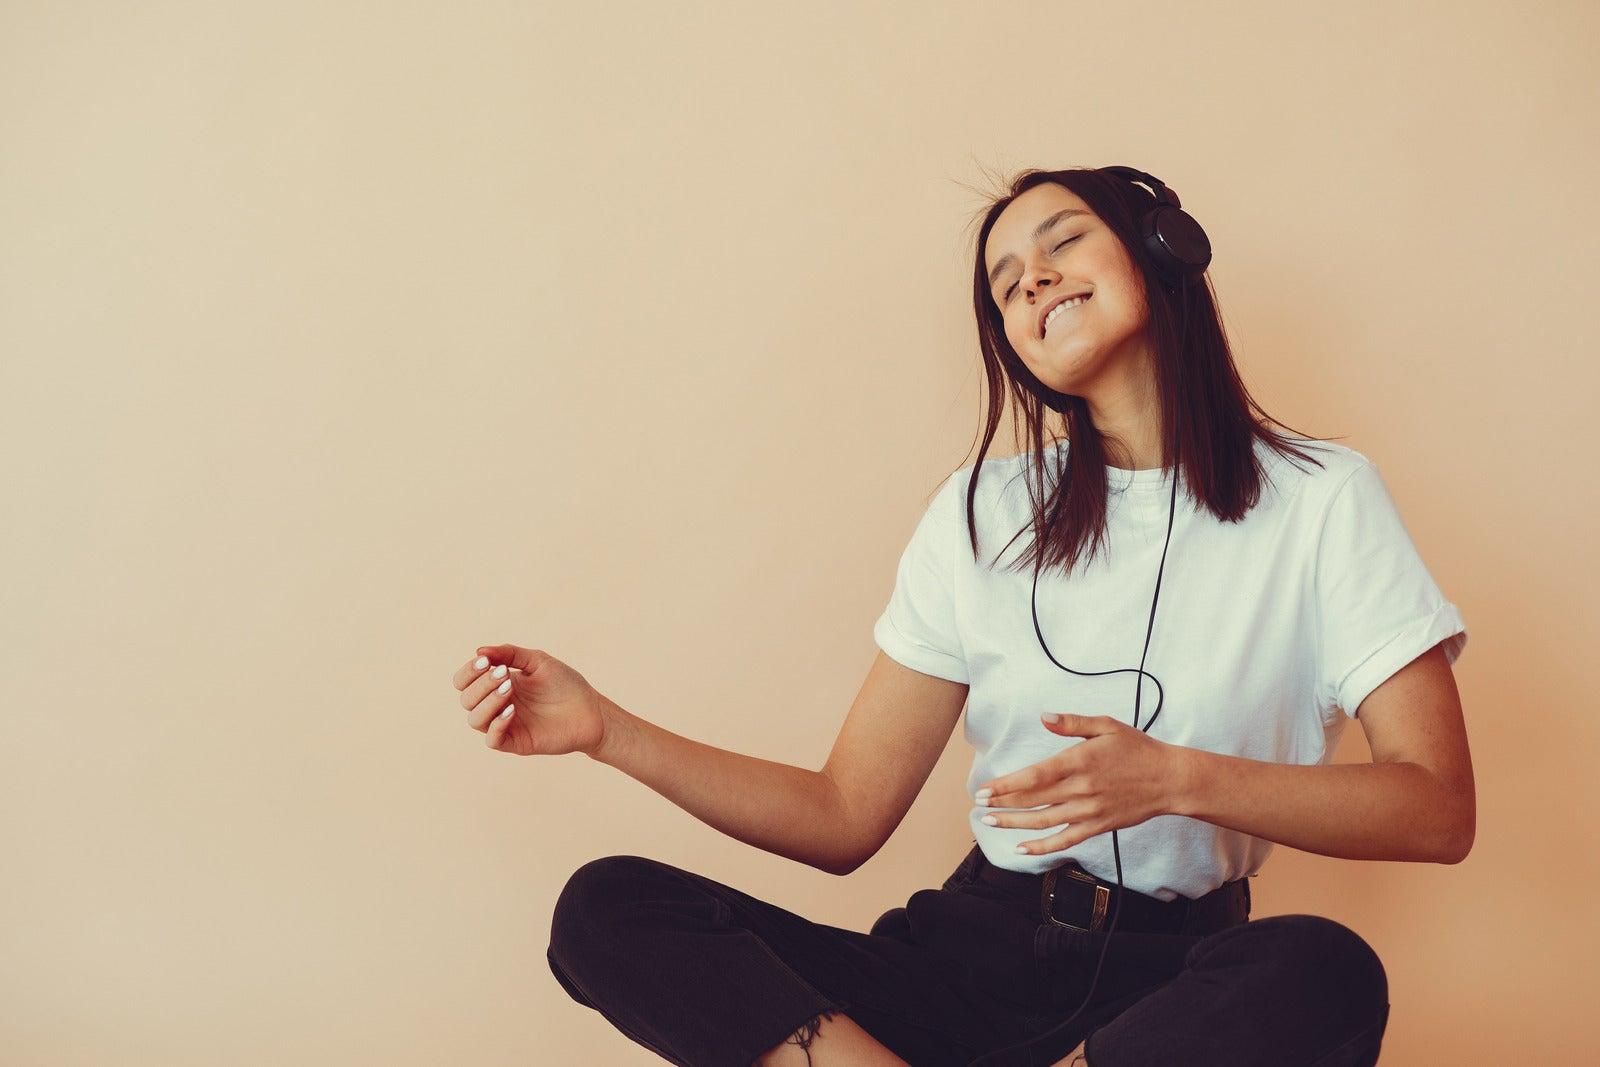 10 of Olivia Rodrigo's Masterful Lyrics Because Her Success Shouldn't be Overshadowed